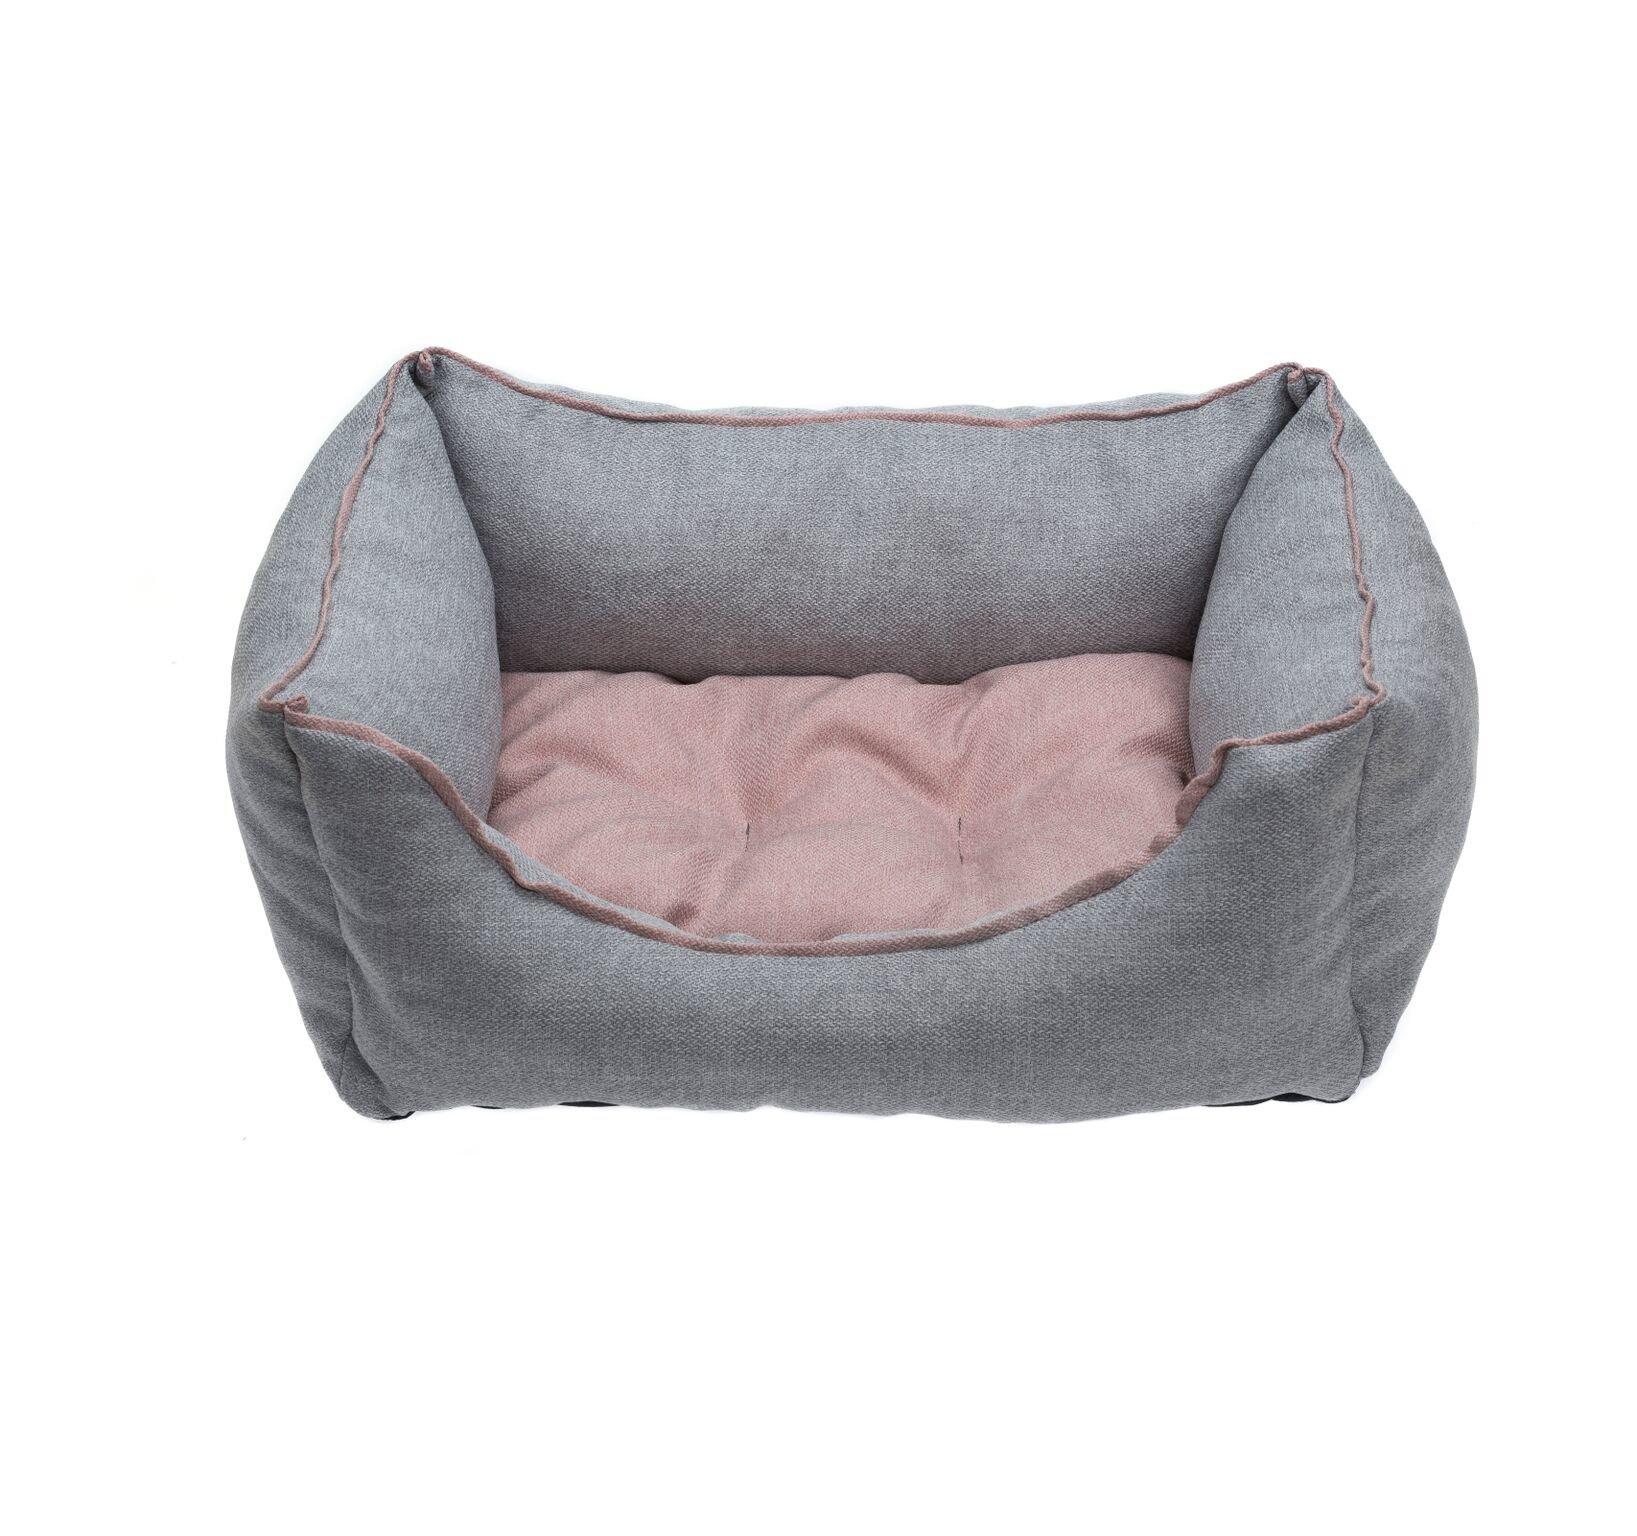 Comfy guolis Emma SOFIA grey/pink, S